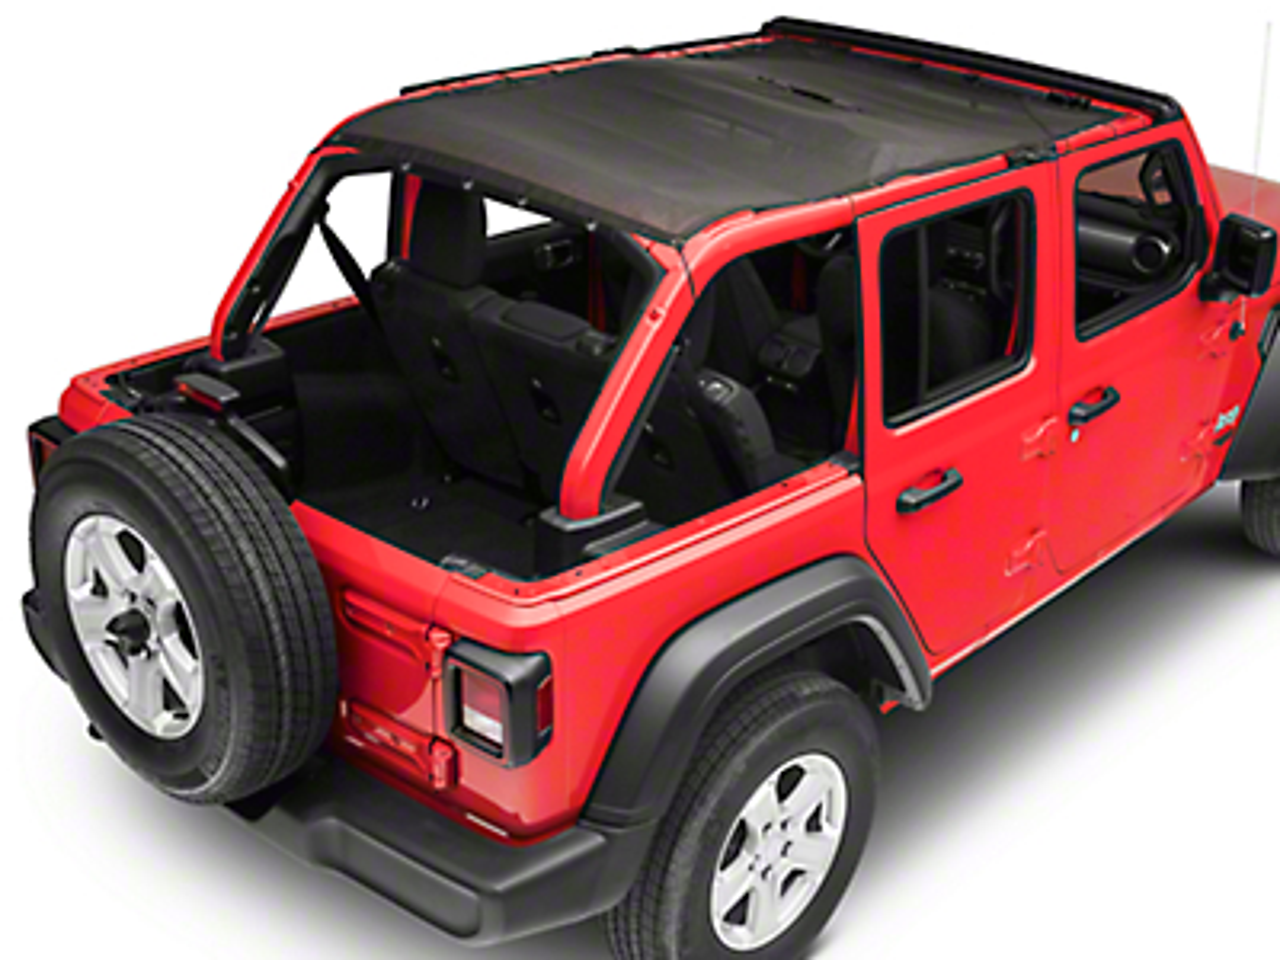 TruShield FullShade Top for Hard Tops (2018 Jeep Wrangler JL 4 Door)